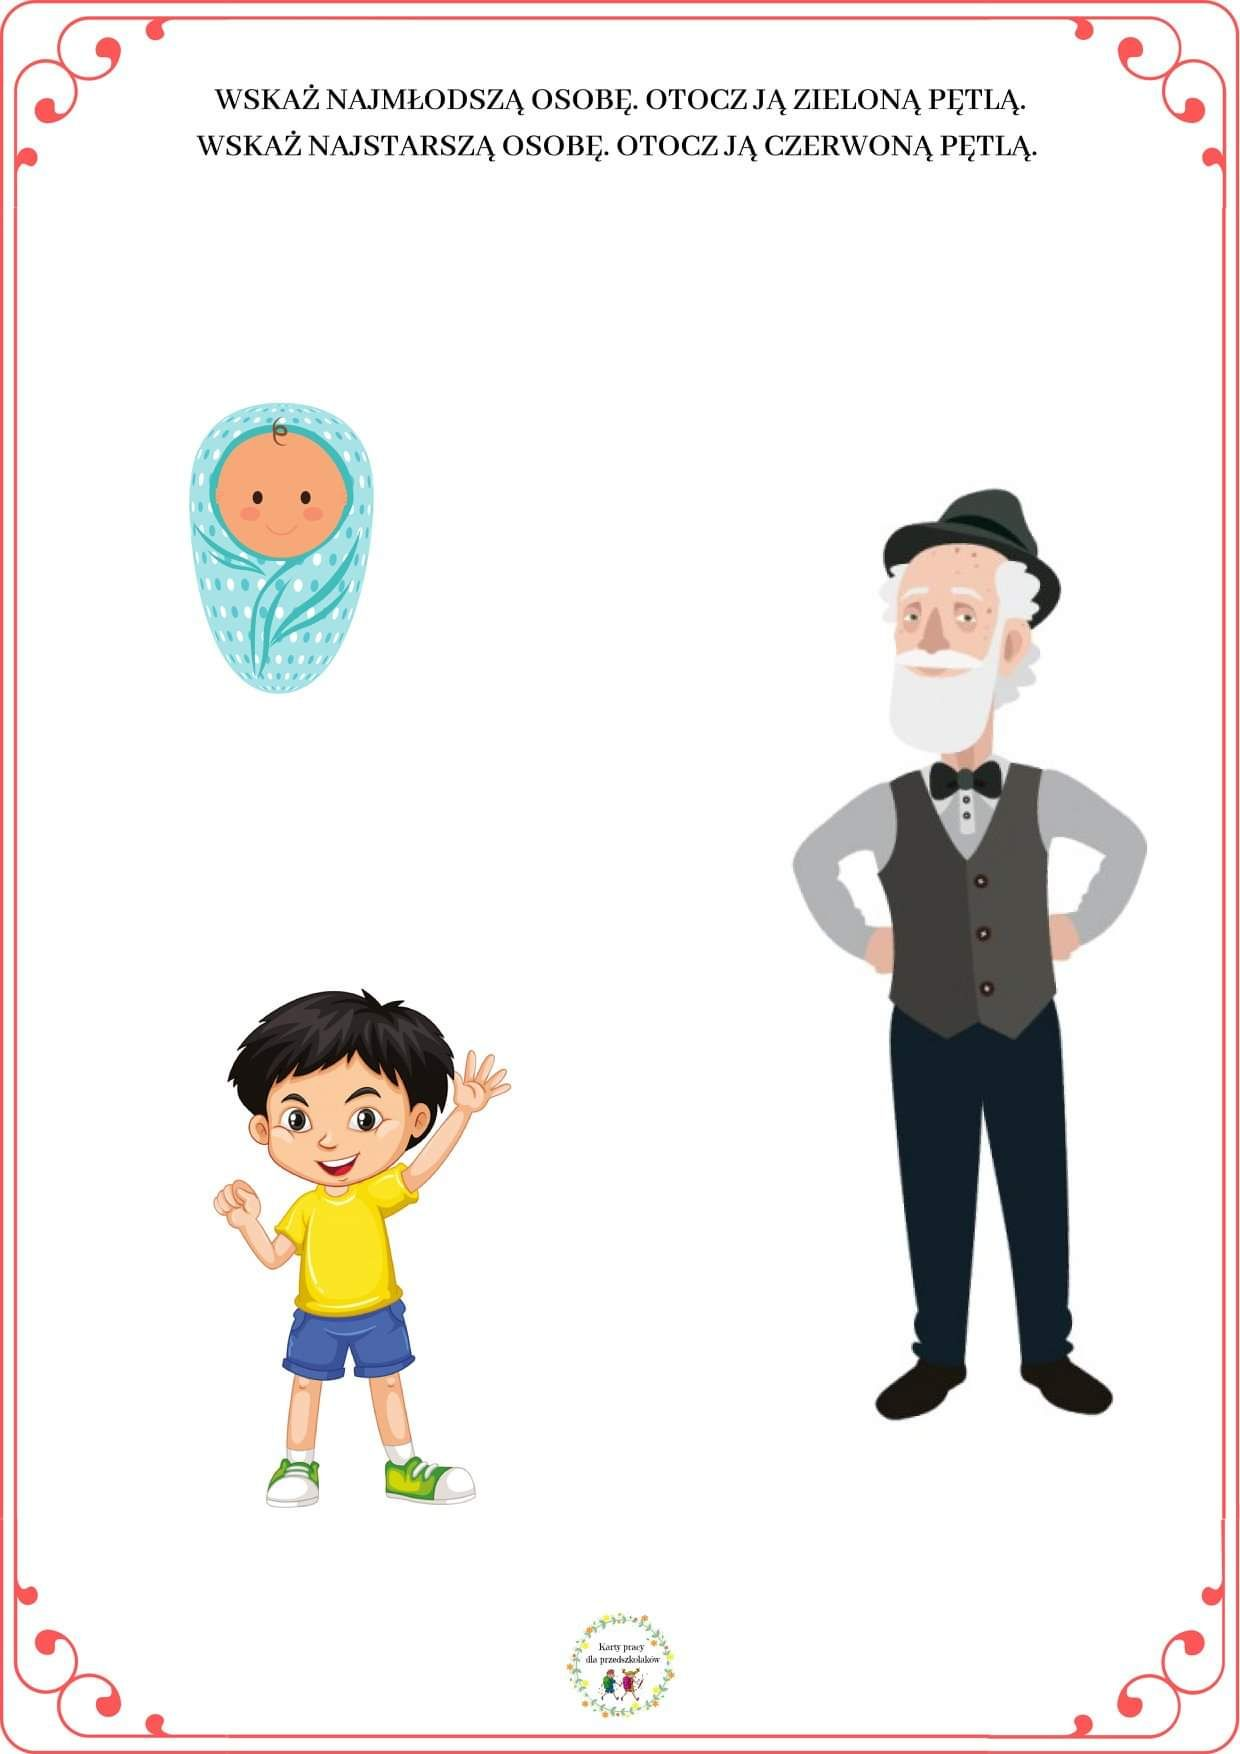 Pin By Justa On Emocje Zachowanie Emotions Behavior Zdrowie In 2020 Vault Boy Family Guy Character